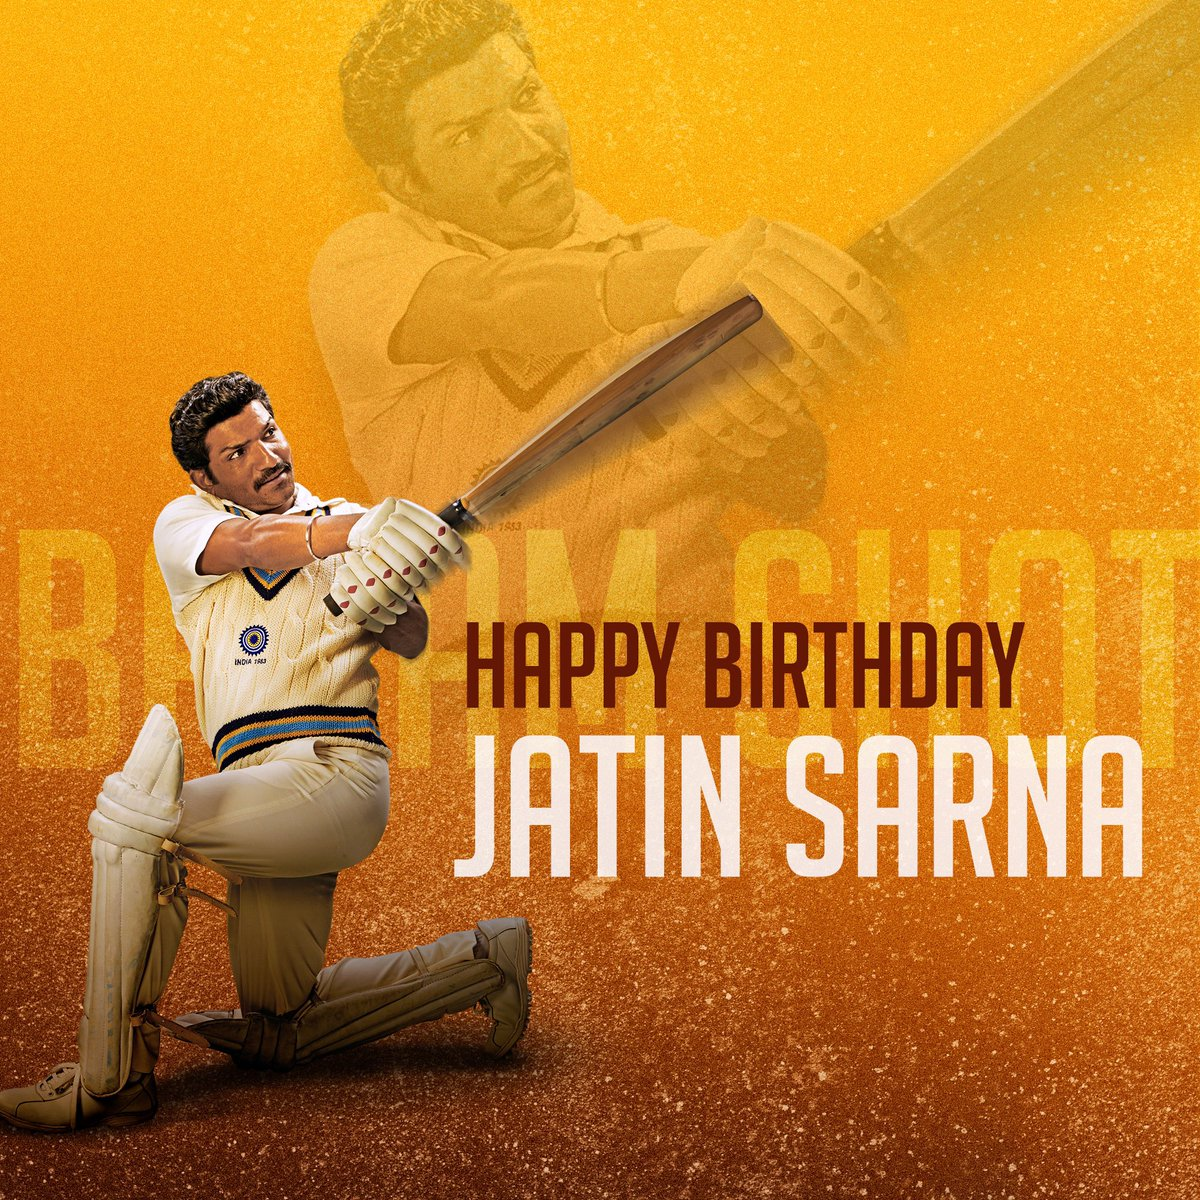 Talent that shines and versatilitythat inspires.Here's wishing our Reel Yashpal Paaji, @jatinsarna, a very happy birthday. #ThisIs83  #HappyBirthdayJatinSarna